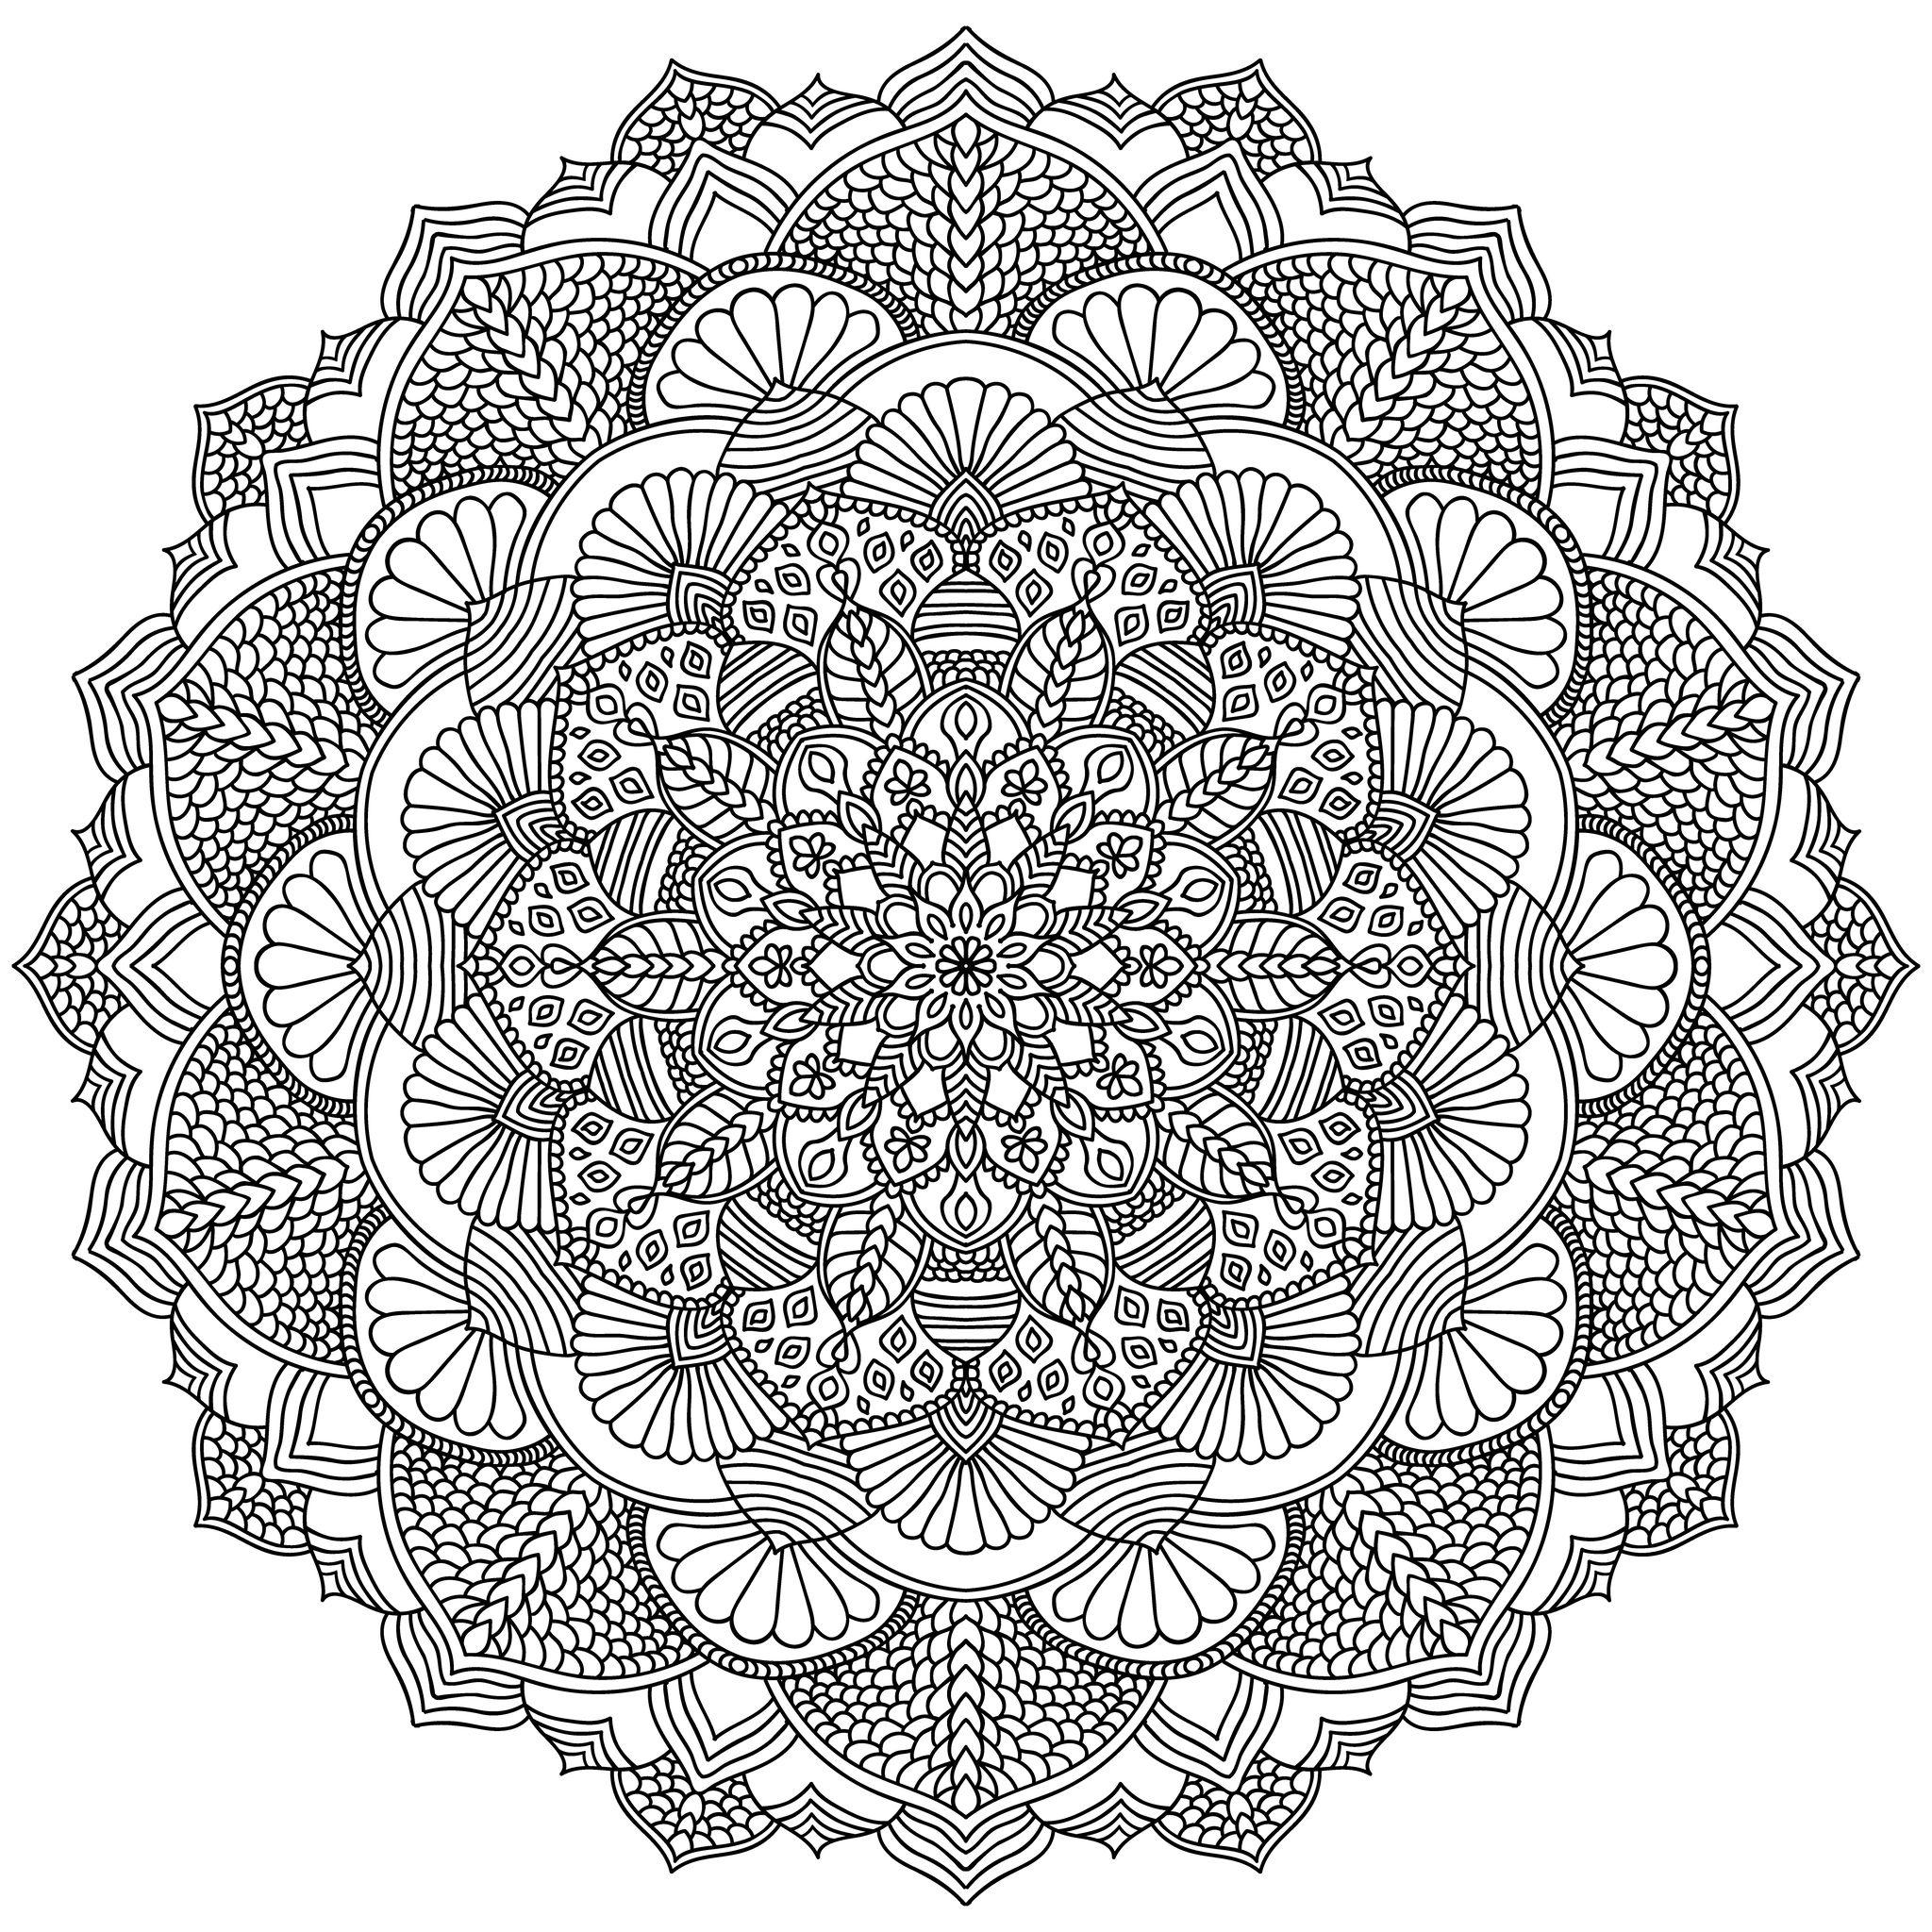 Intricate Black Mandala for Coloring. Line mandala isolated on white background.